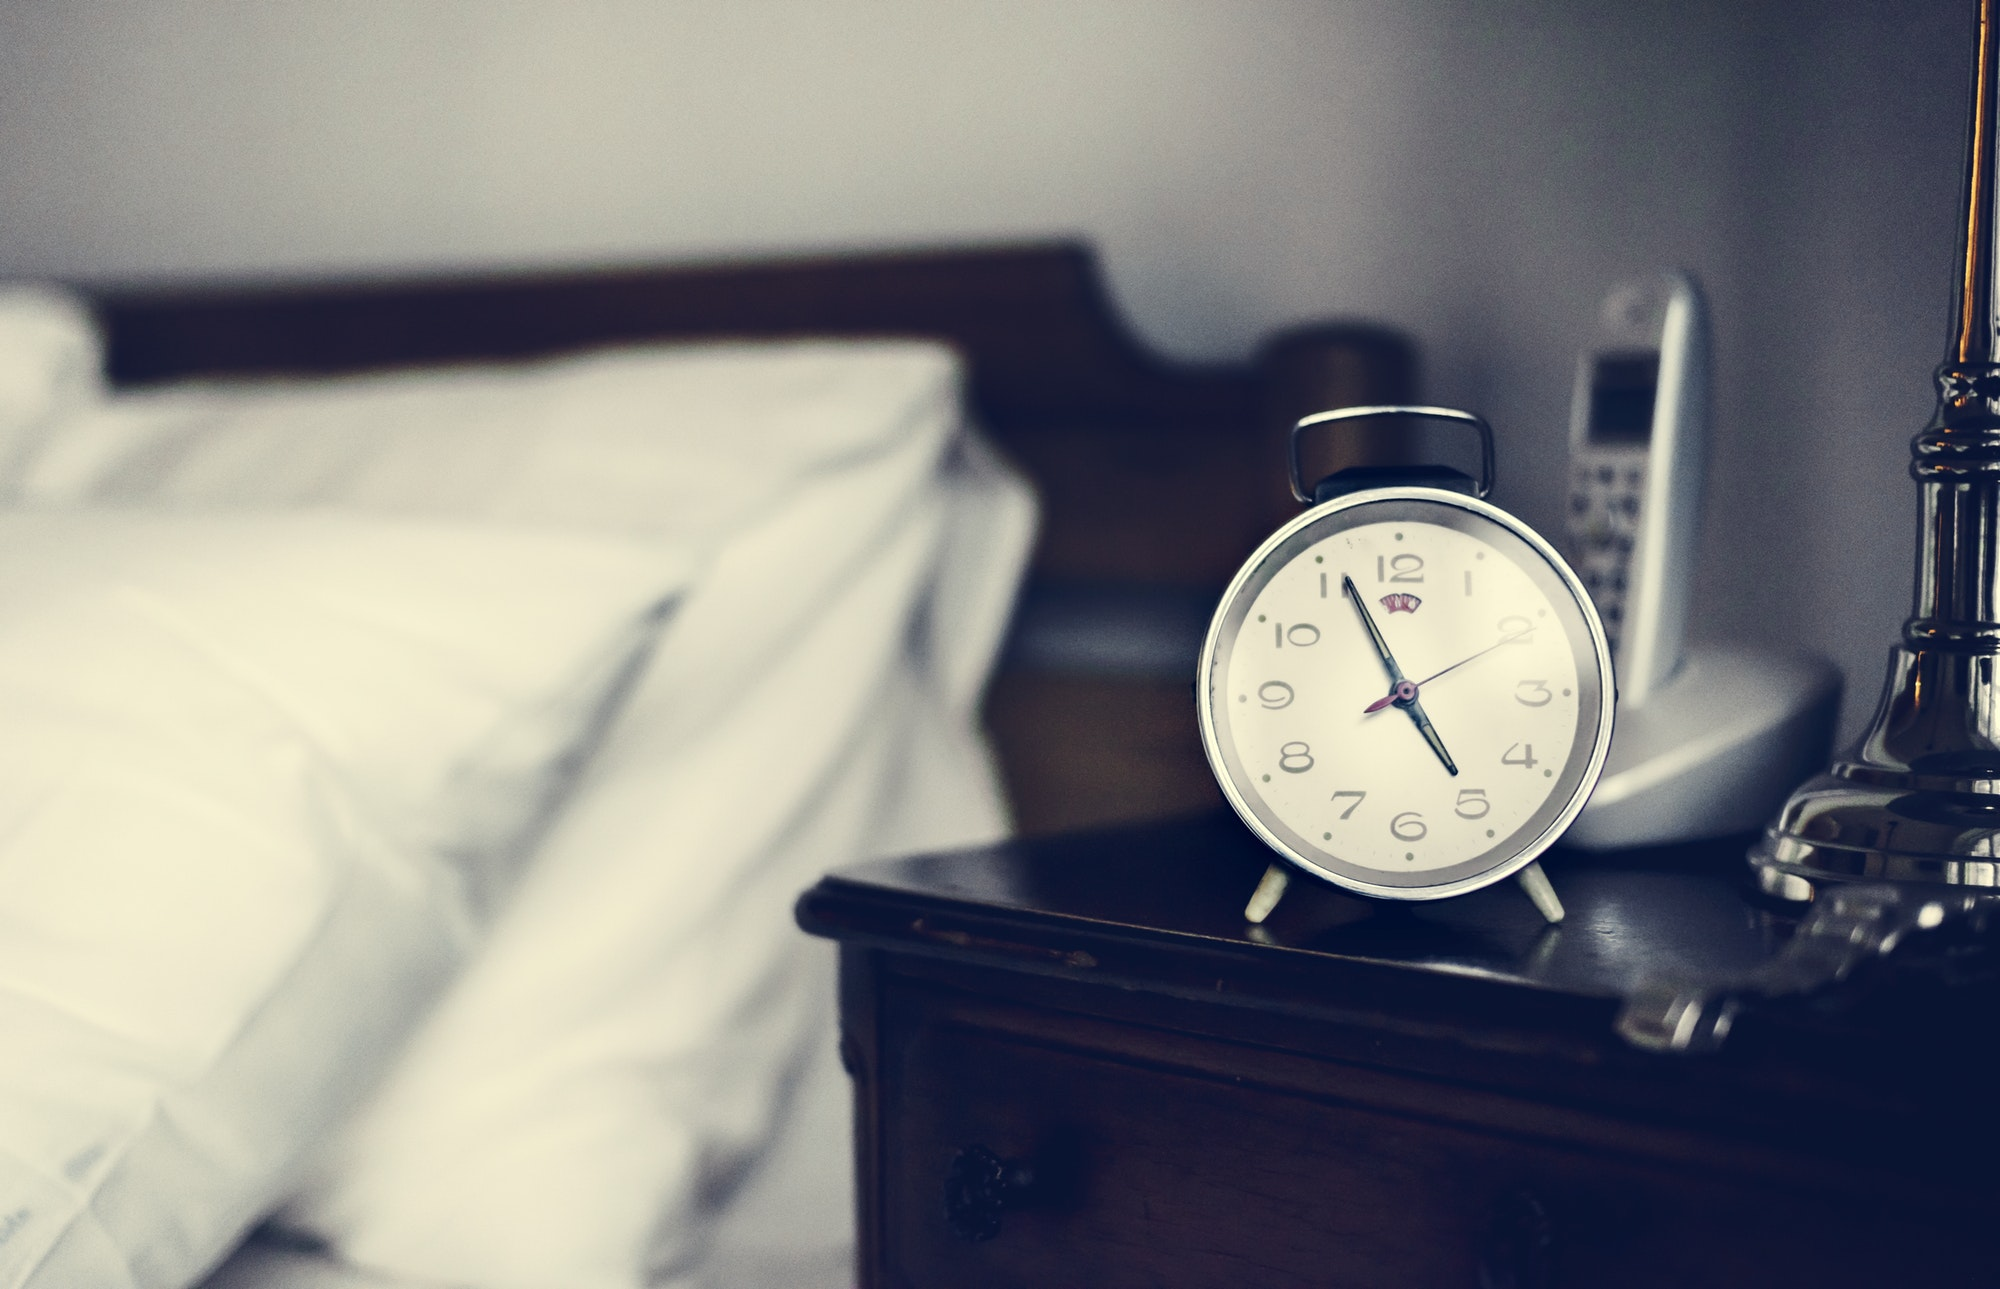 Bedroom alarm clock